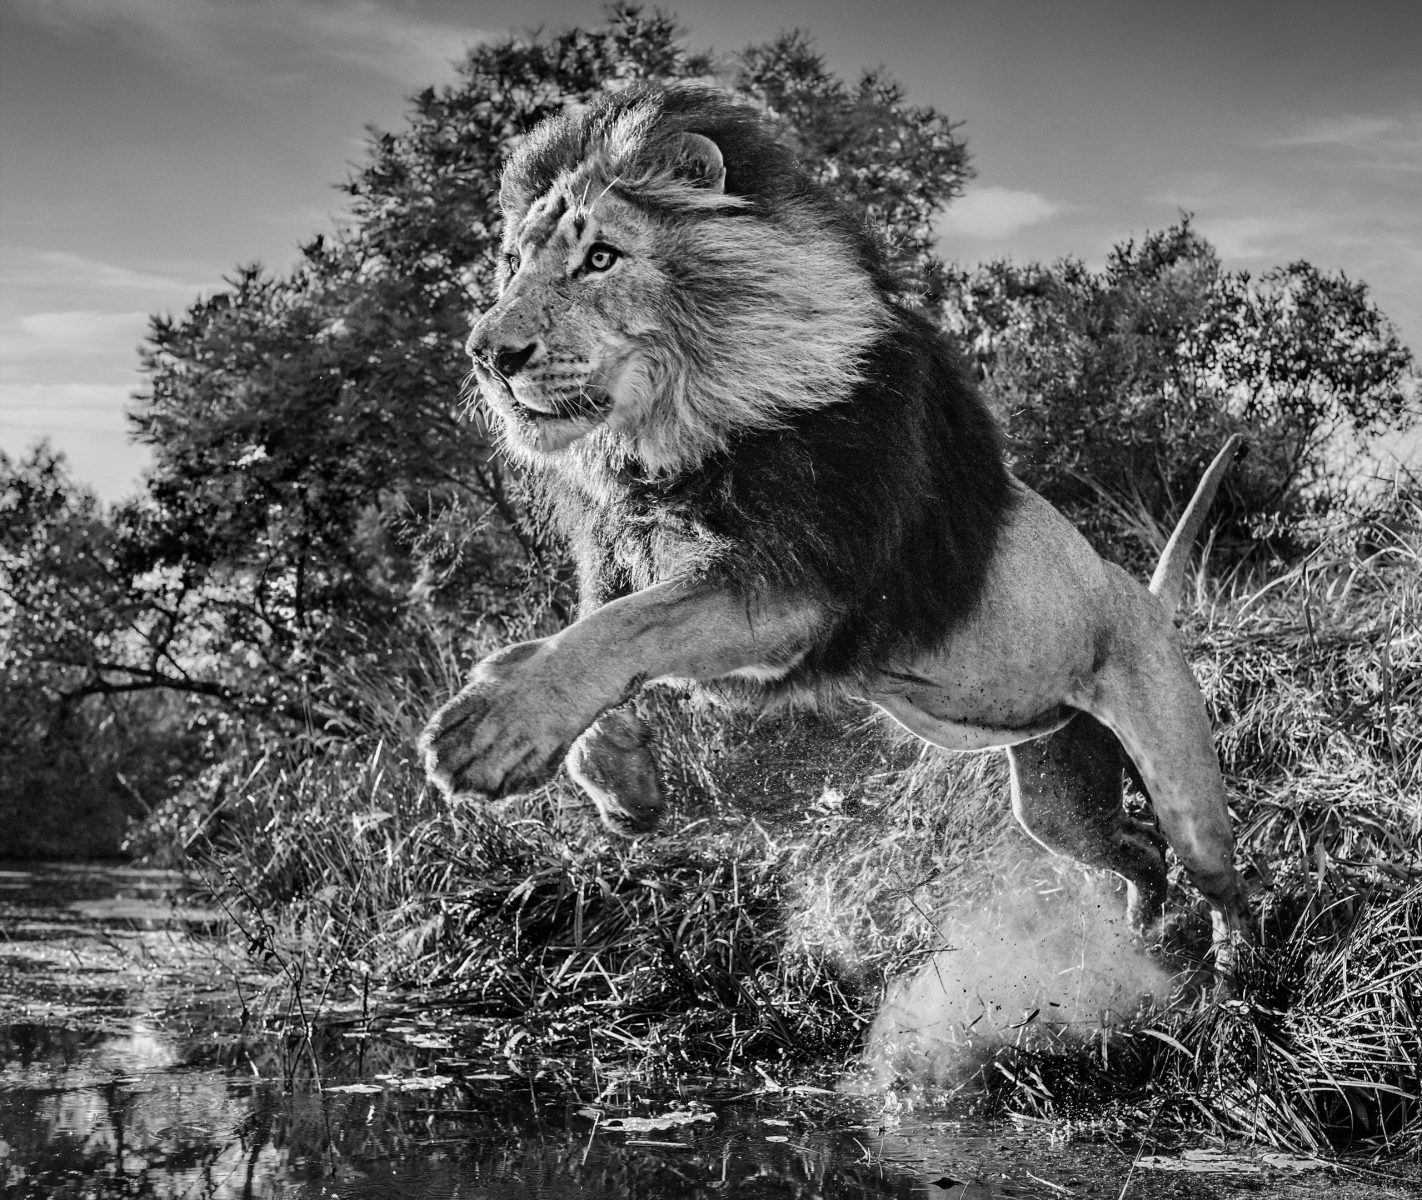 Tusk Lion Trail 2021